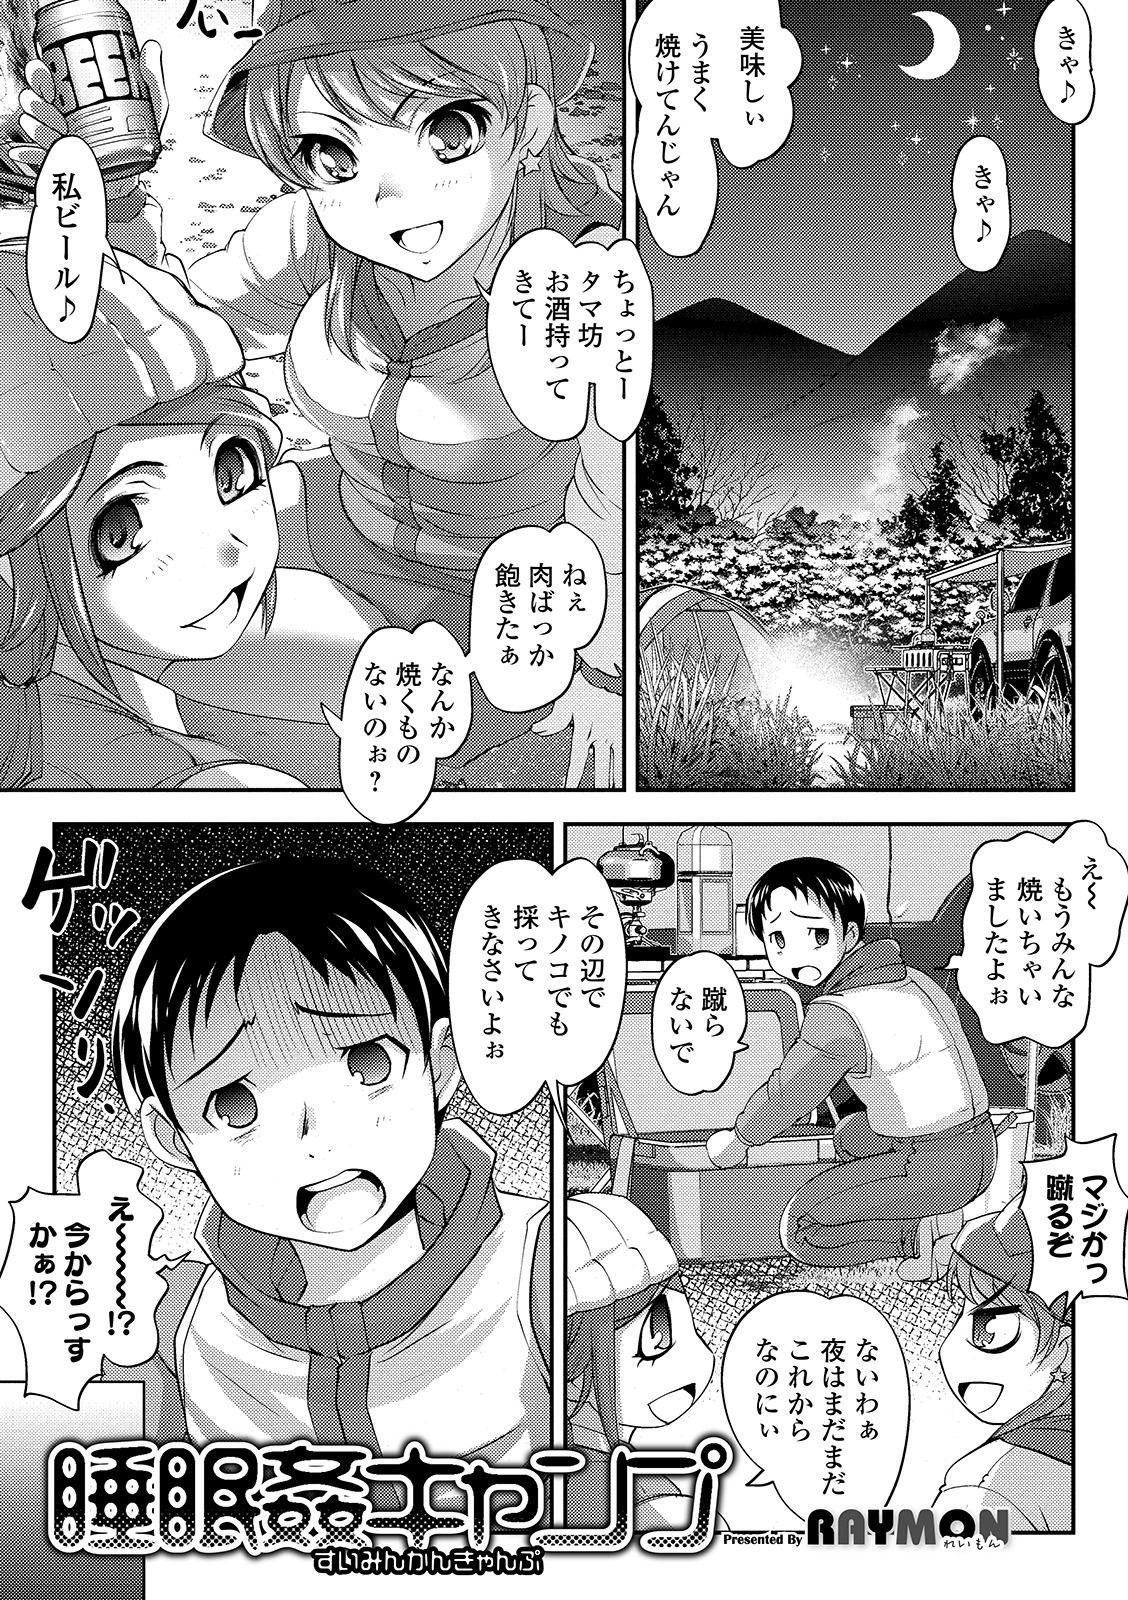 COMIC Shigekiteki SQUIRT!! Vol. 15 150